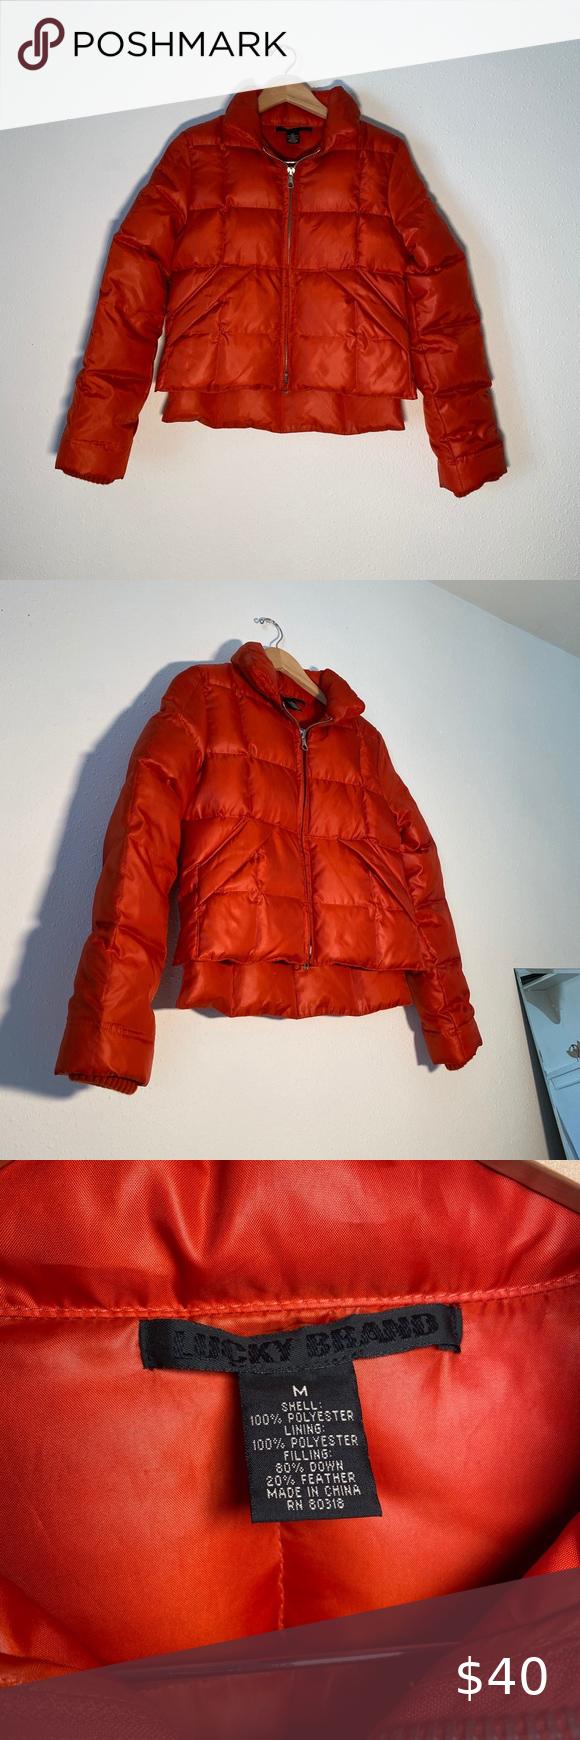 Lucky Brand Red Orange Crop Puffer Coat M Puffer Coat Red Puffer Jacket Lucky Brand [ 1740 x 580 Pixel ]